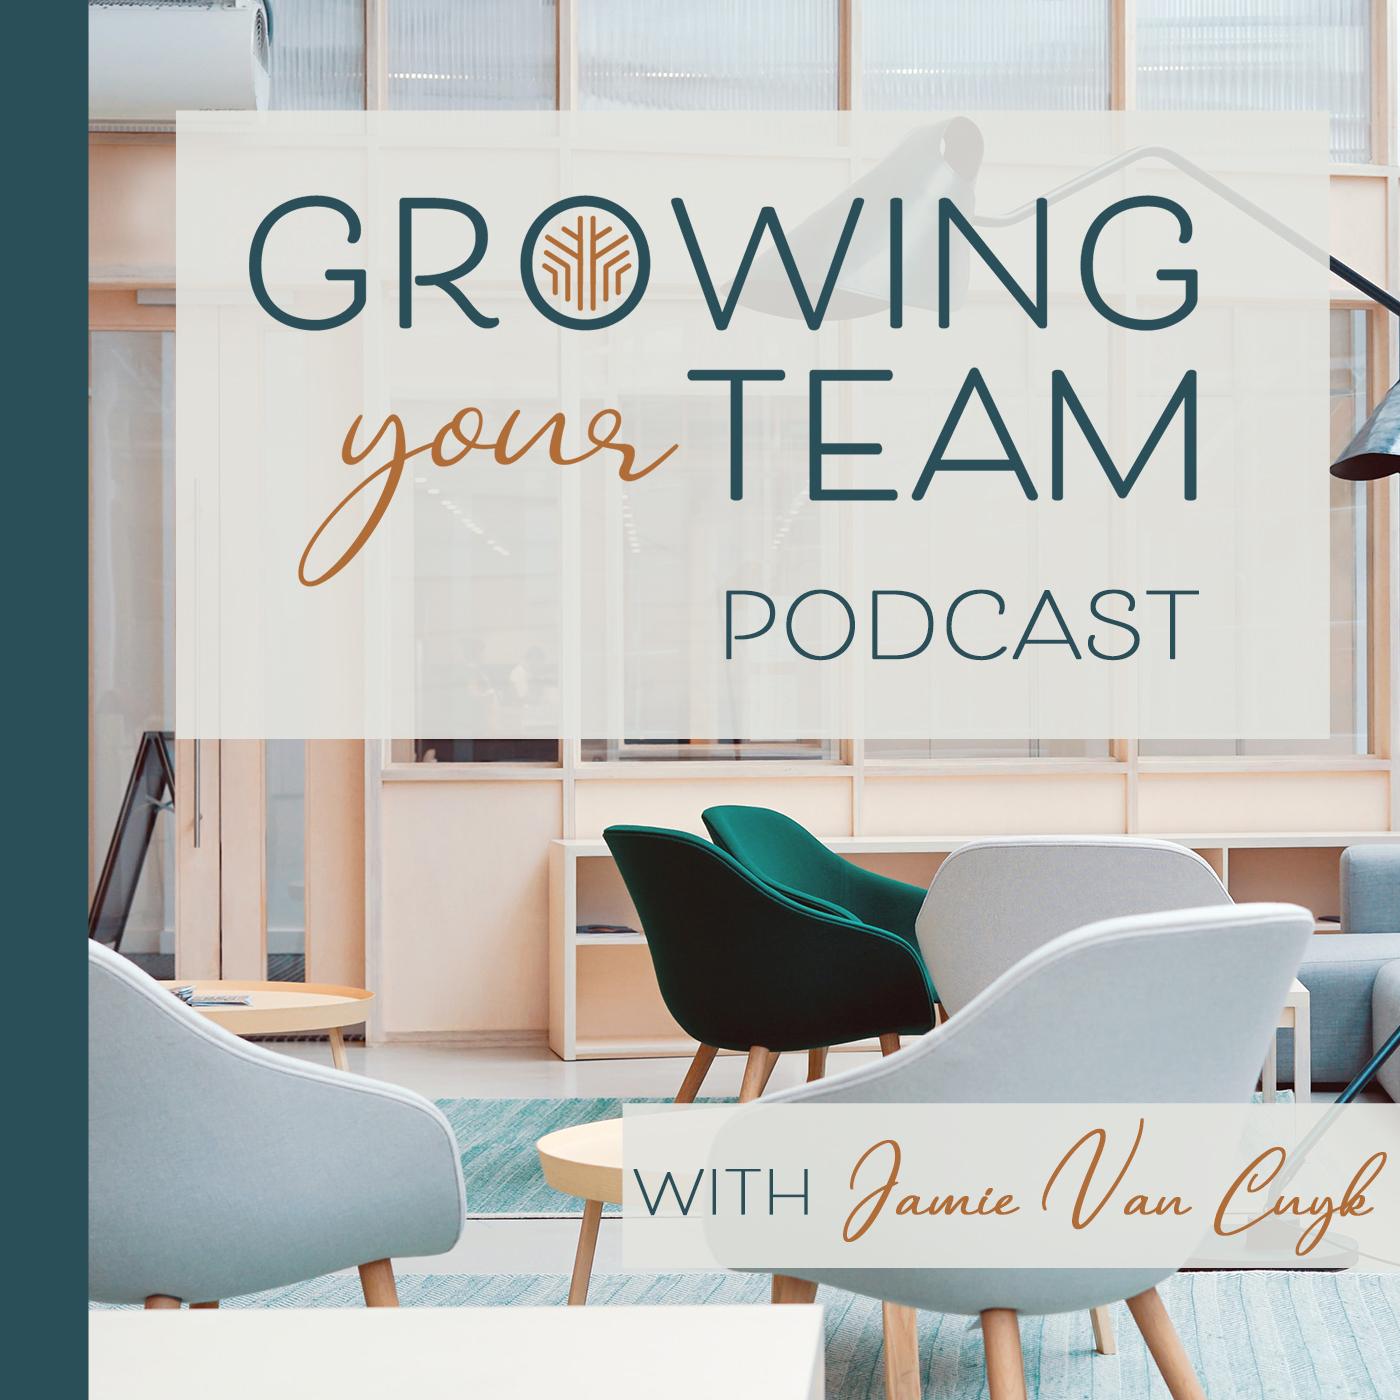 Growing Your Team Podcast with Jamie Van Cuyk show art